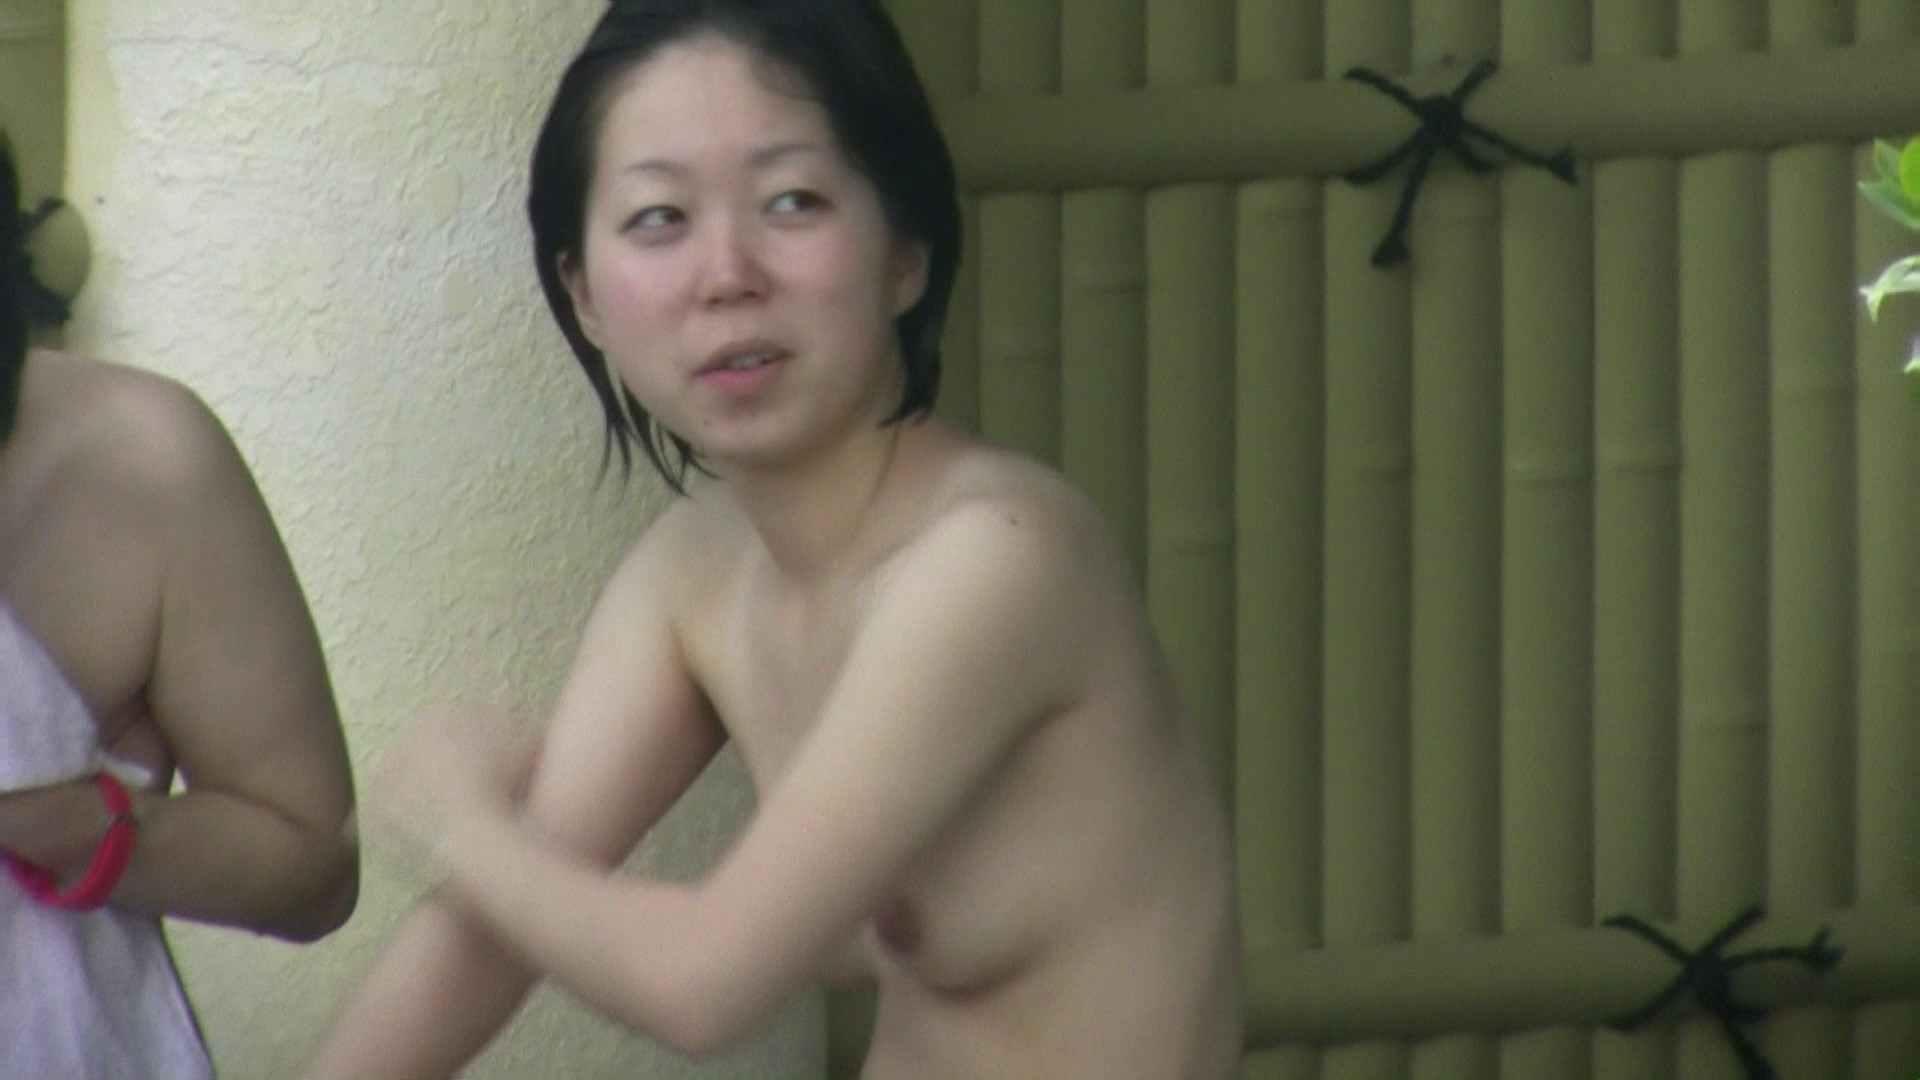 Aquaな露天風呂Vol.06【VIP】 HなOL | 盗撮  86pic 75